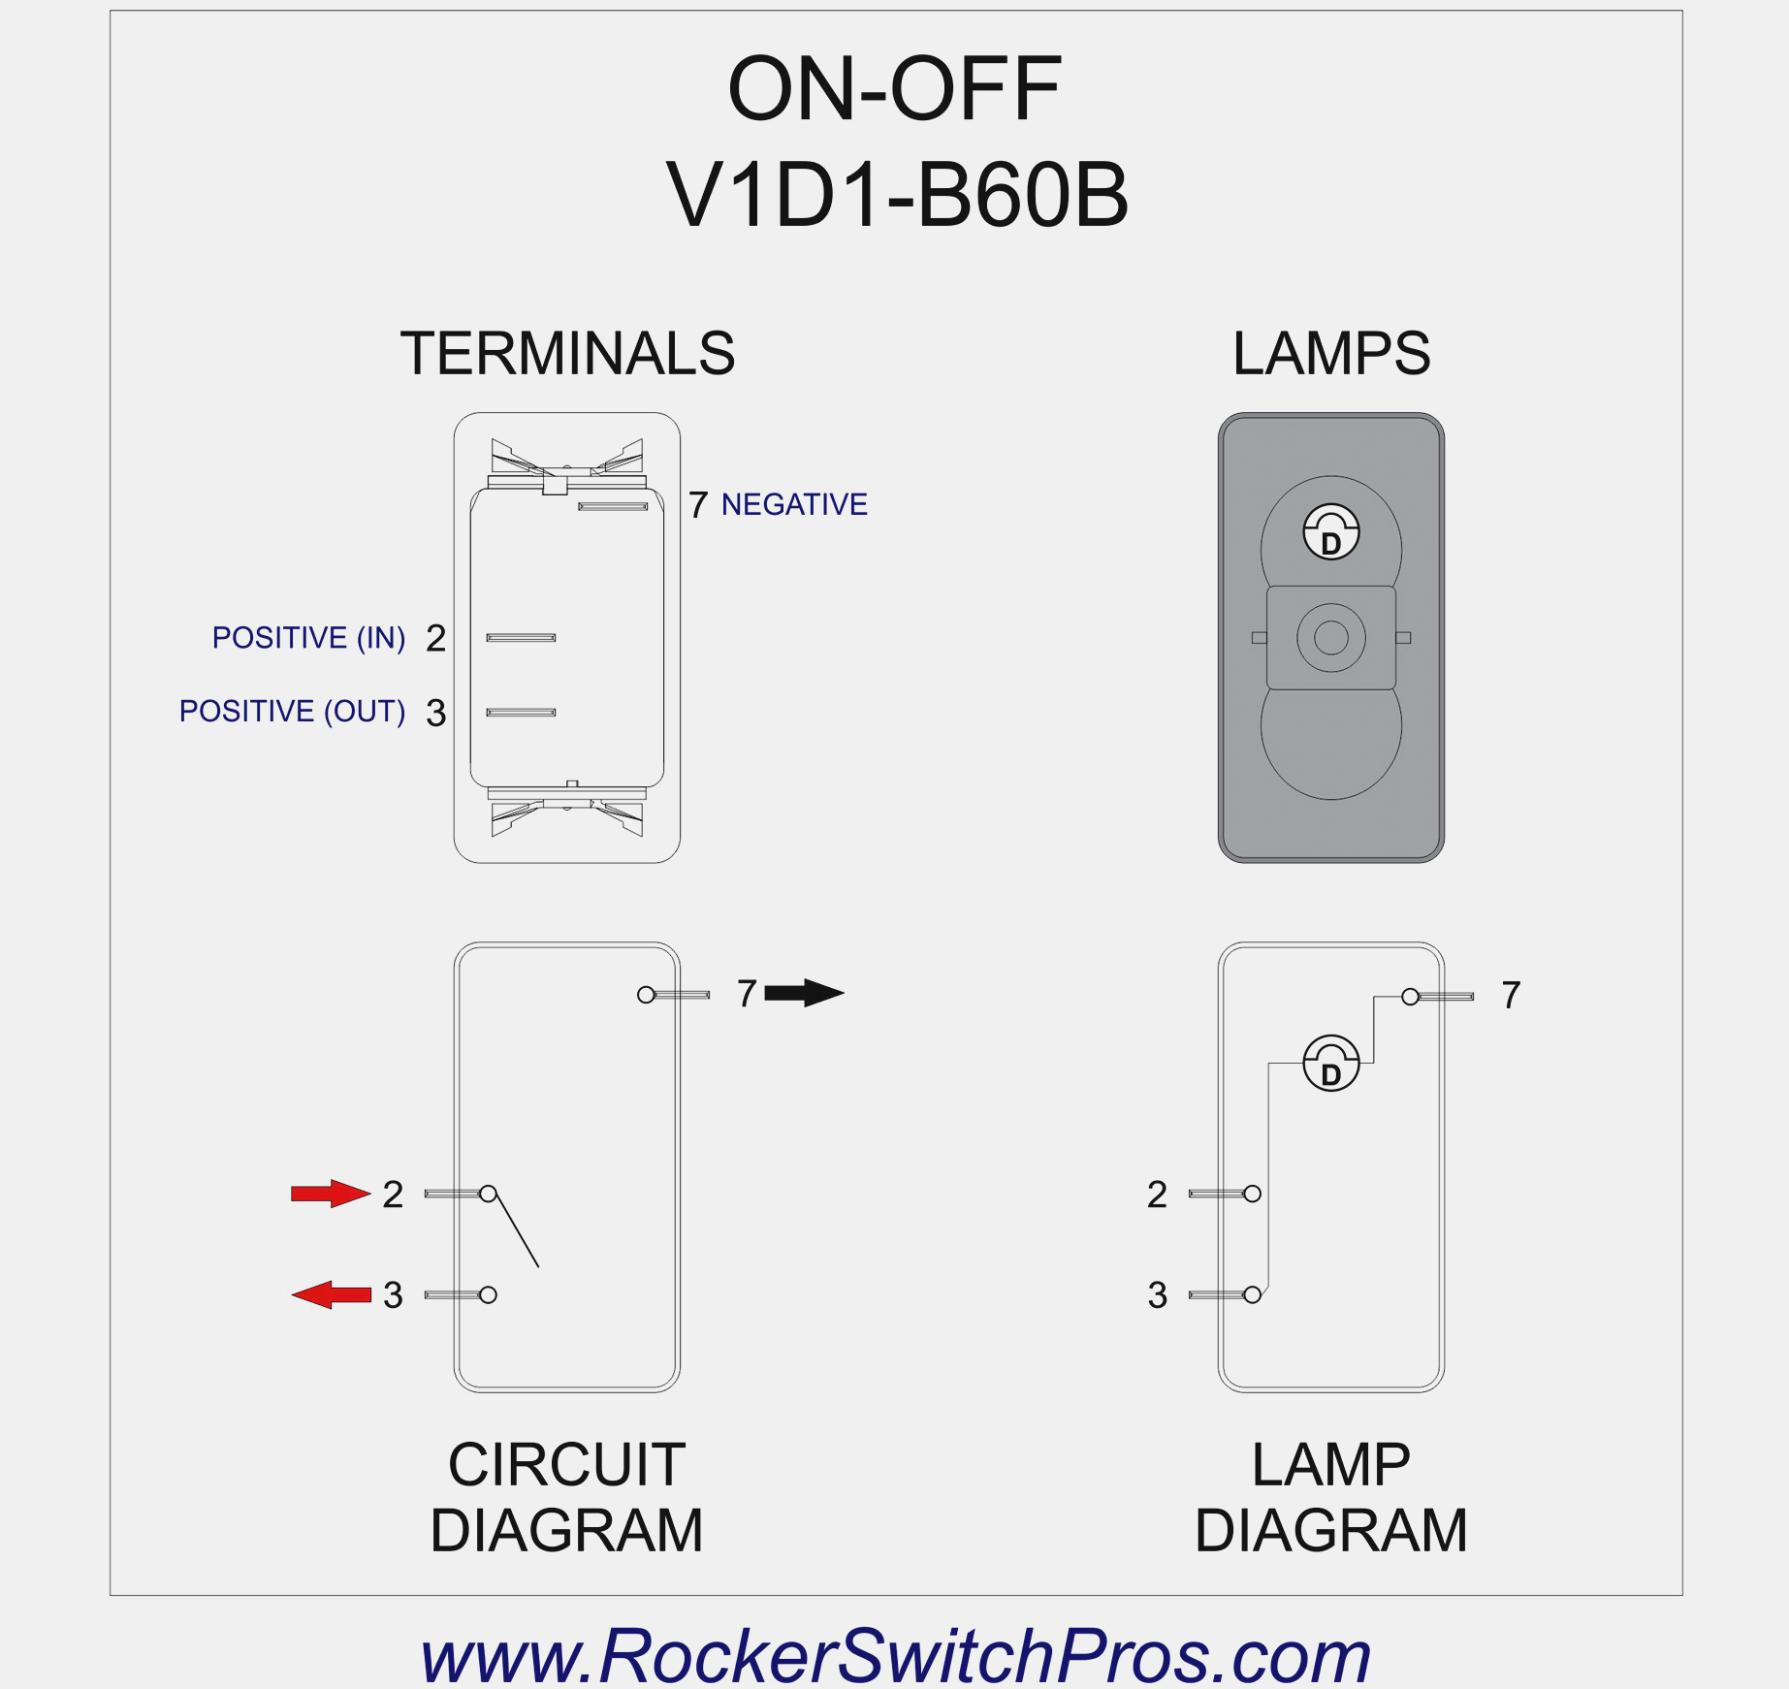 Lighted Rocker Switch Wiring Diagram 120V | Best Wiring Library - Lighted Rocker Switch Wiring Diagram 120V